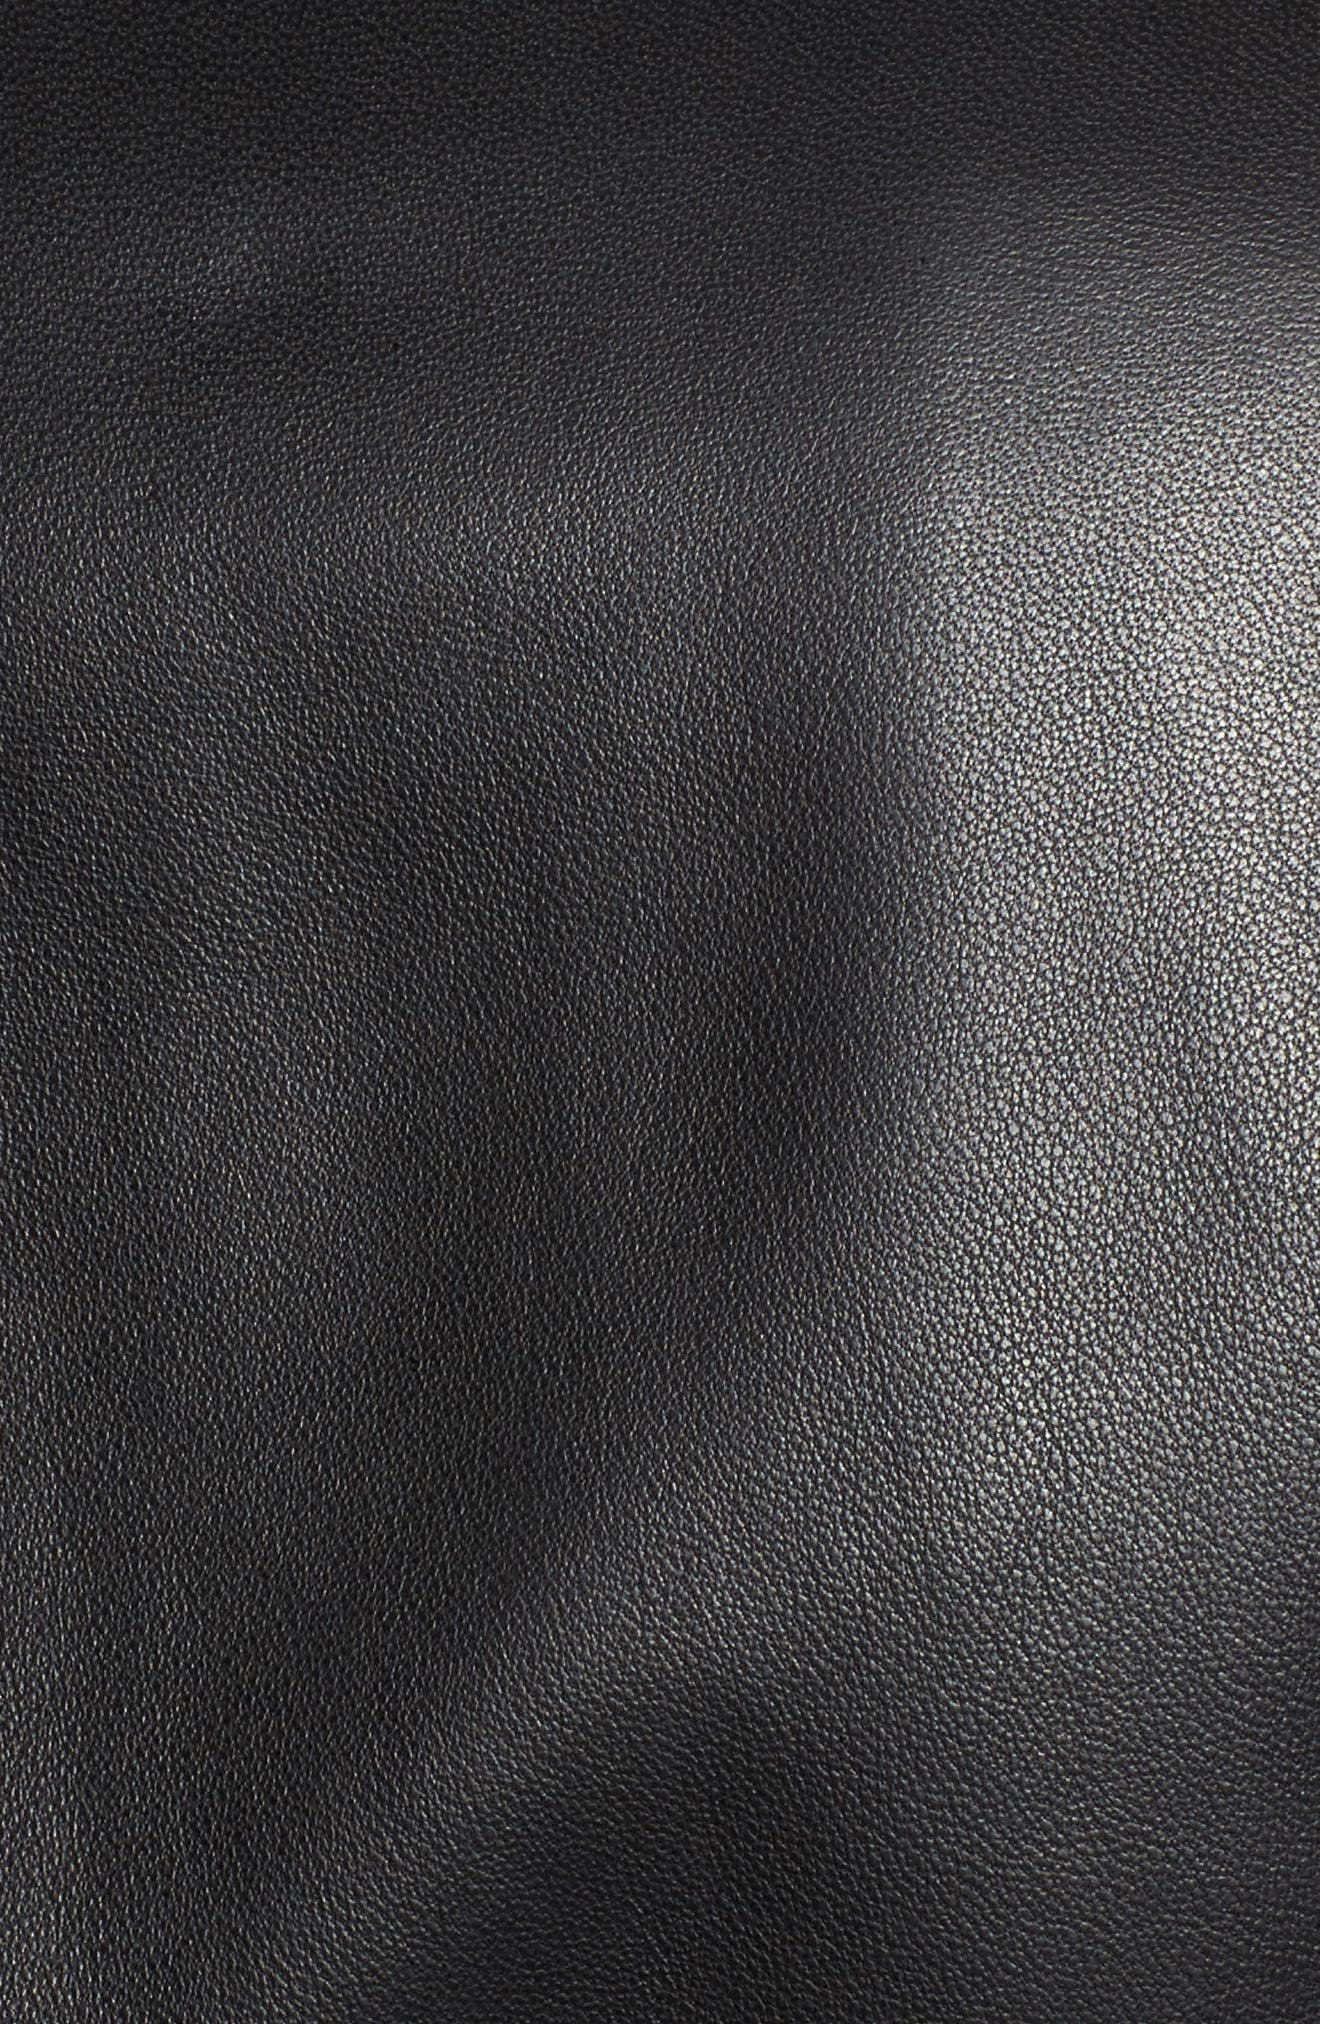 Lambskin Leather Scuba Jacket,                             Alternate thumbnail 5, color,                             Black